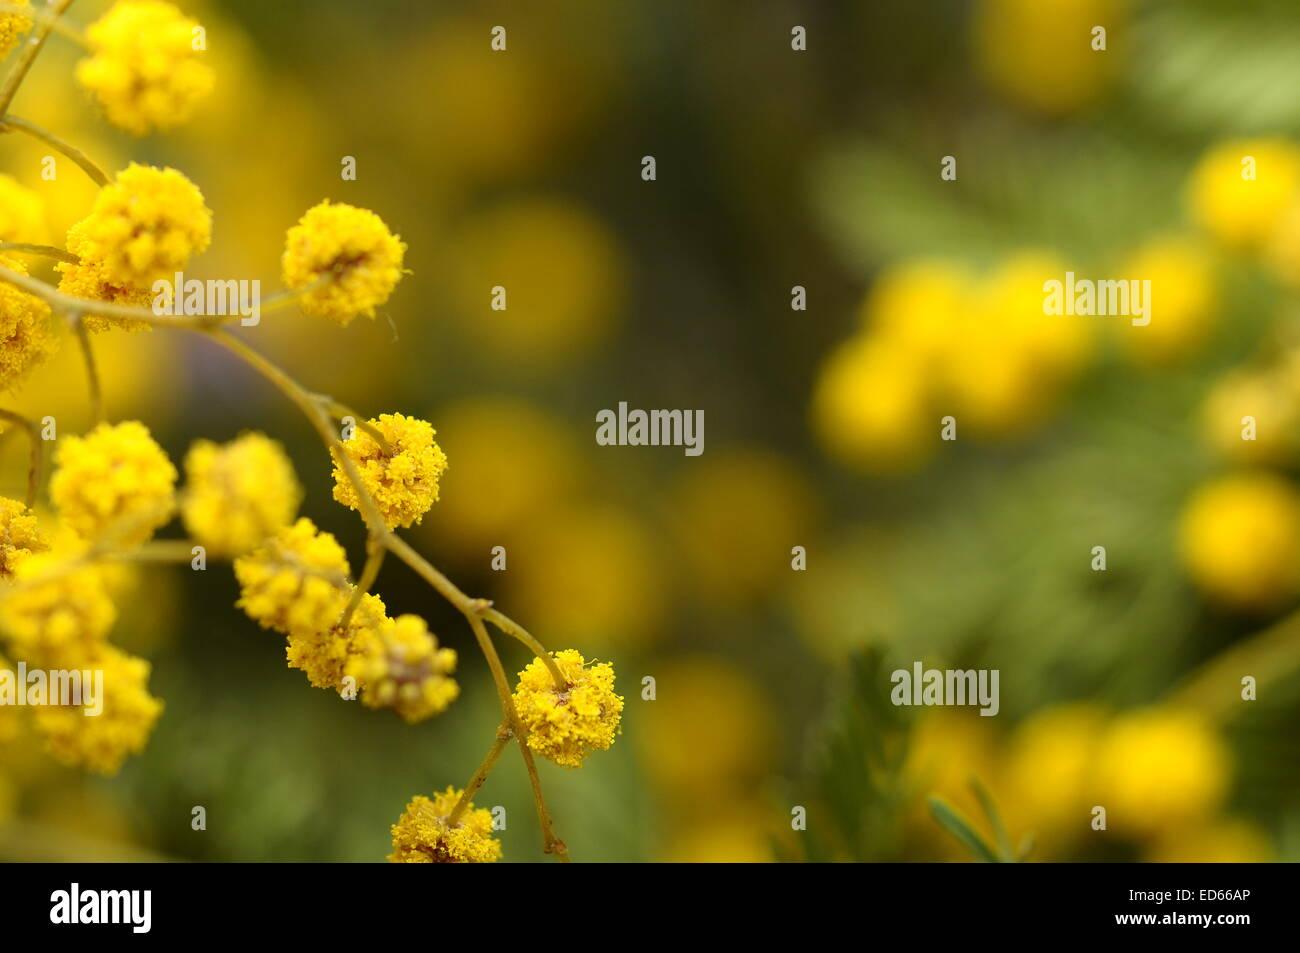 Yellow Mimosa Flower Stock Photos Yellow Mimosa Flower Stock